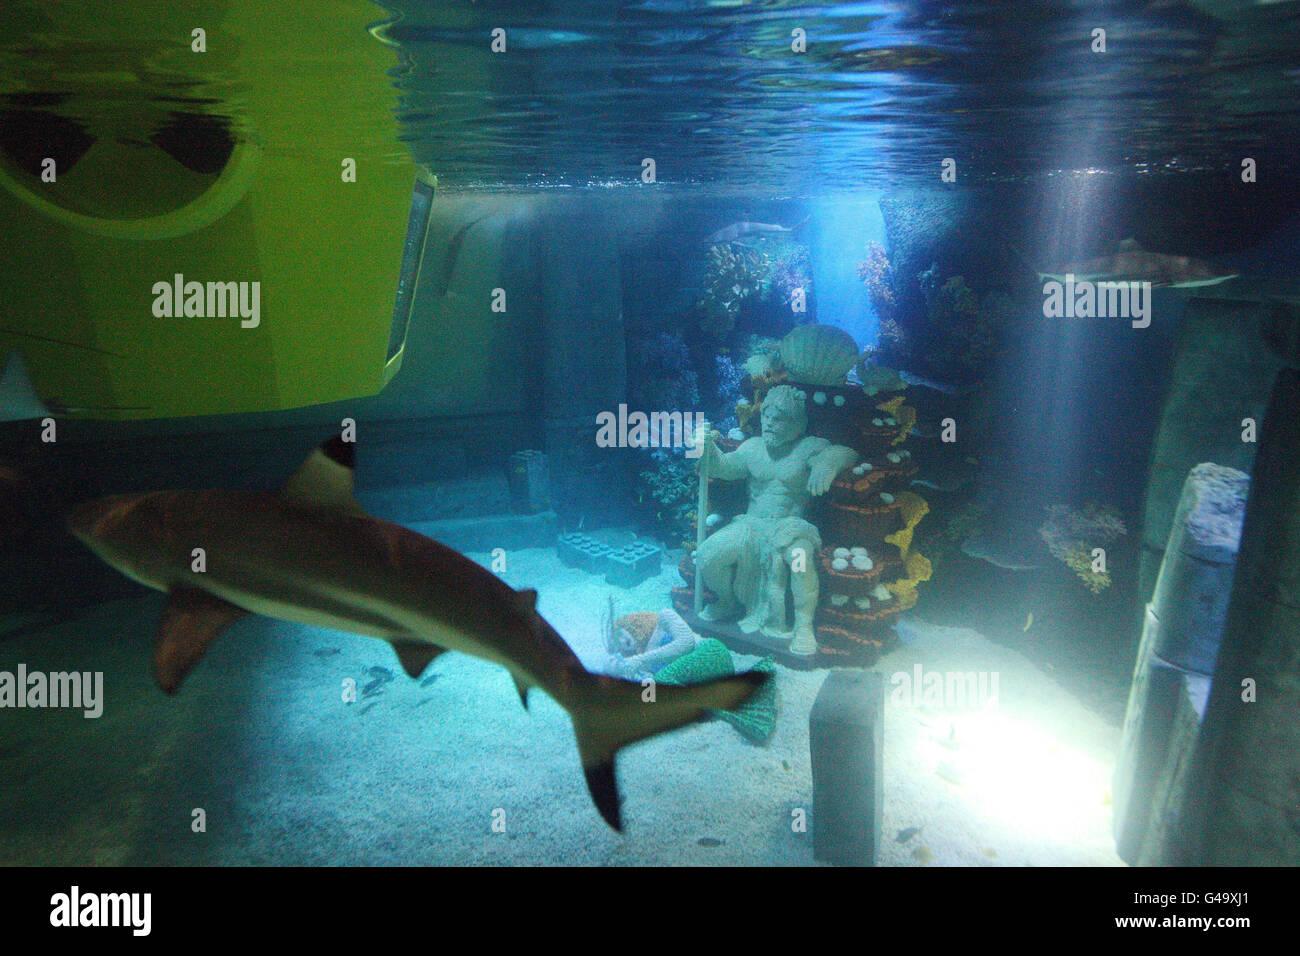 New Legoland Atlantis ride Stock Photo